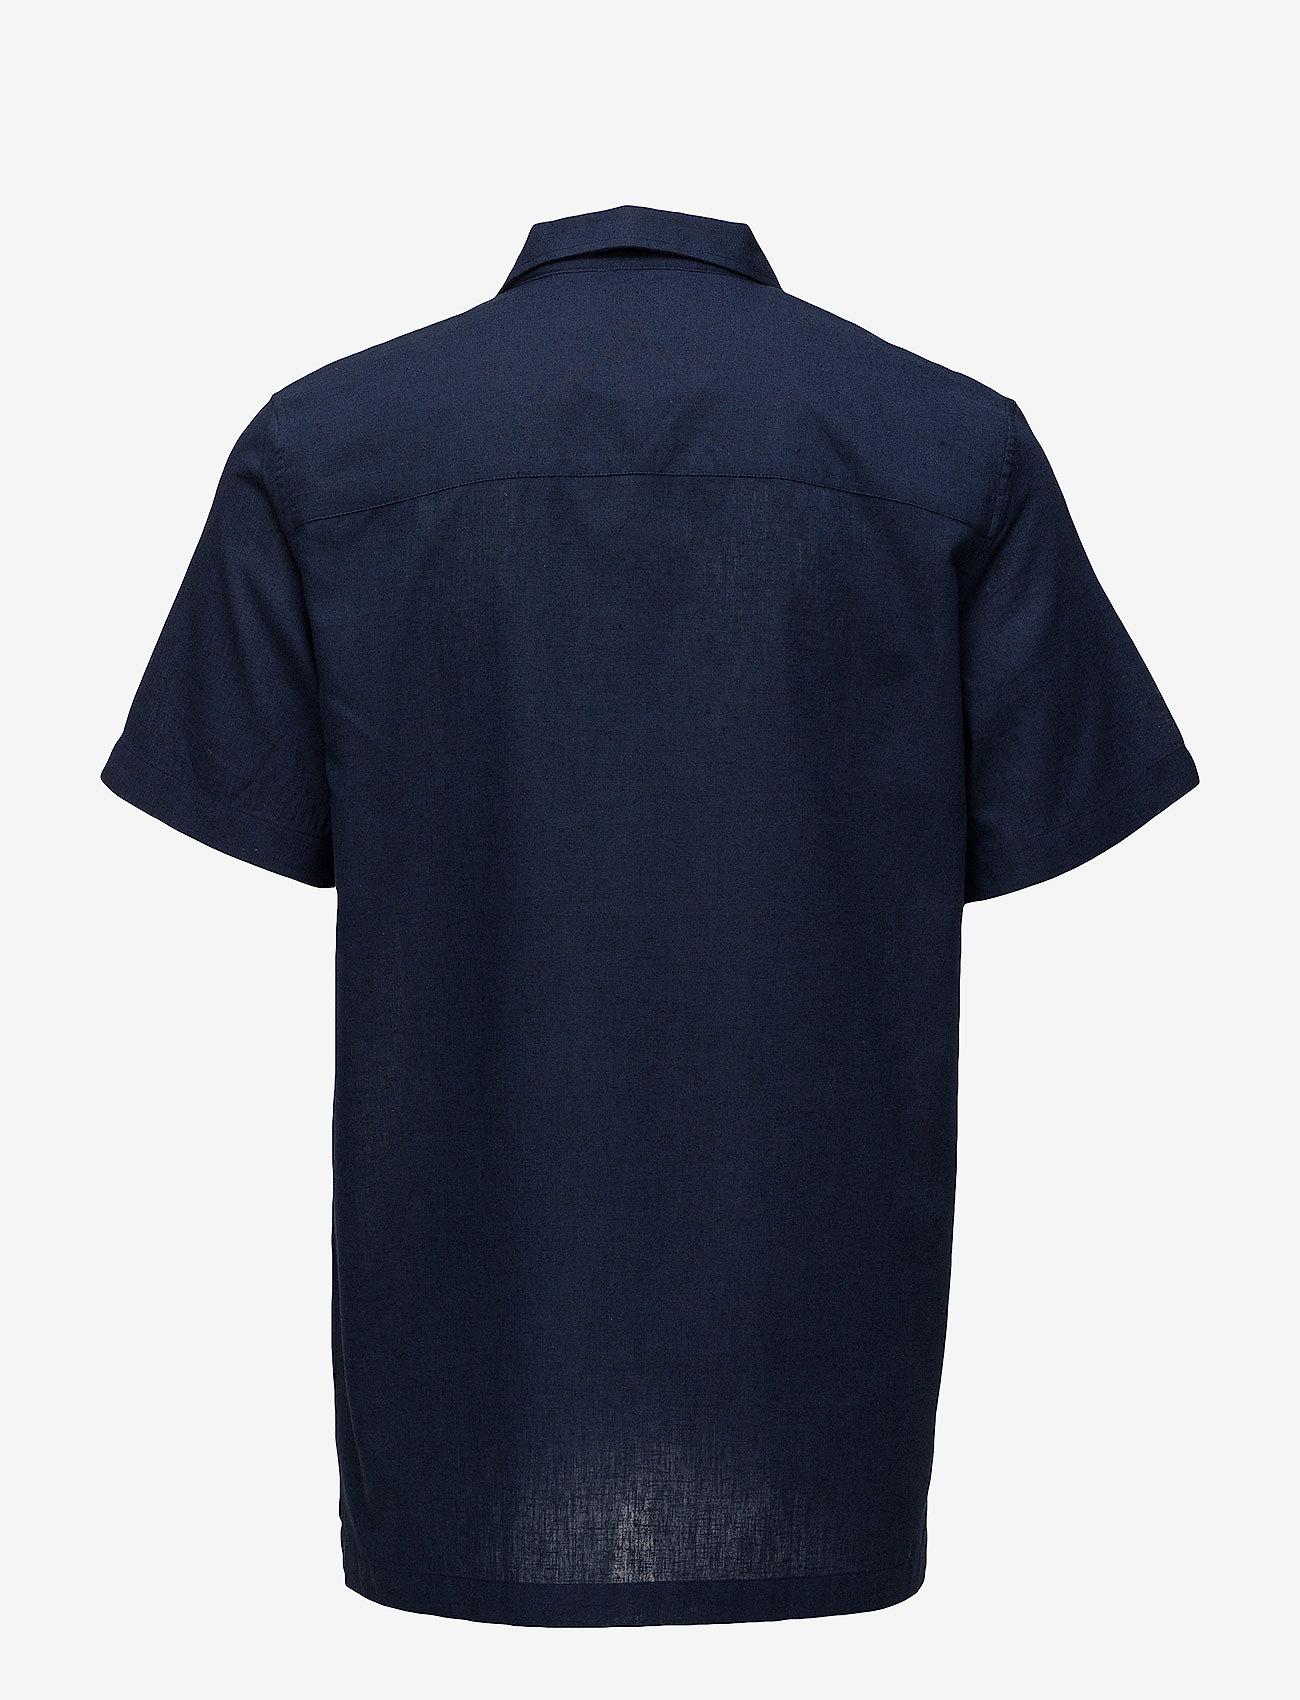 Lyle & Scott - Resort Shirt - koszule lniane - navy - 1